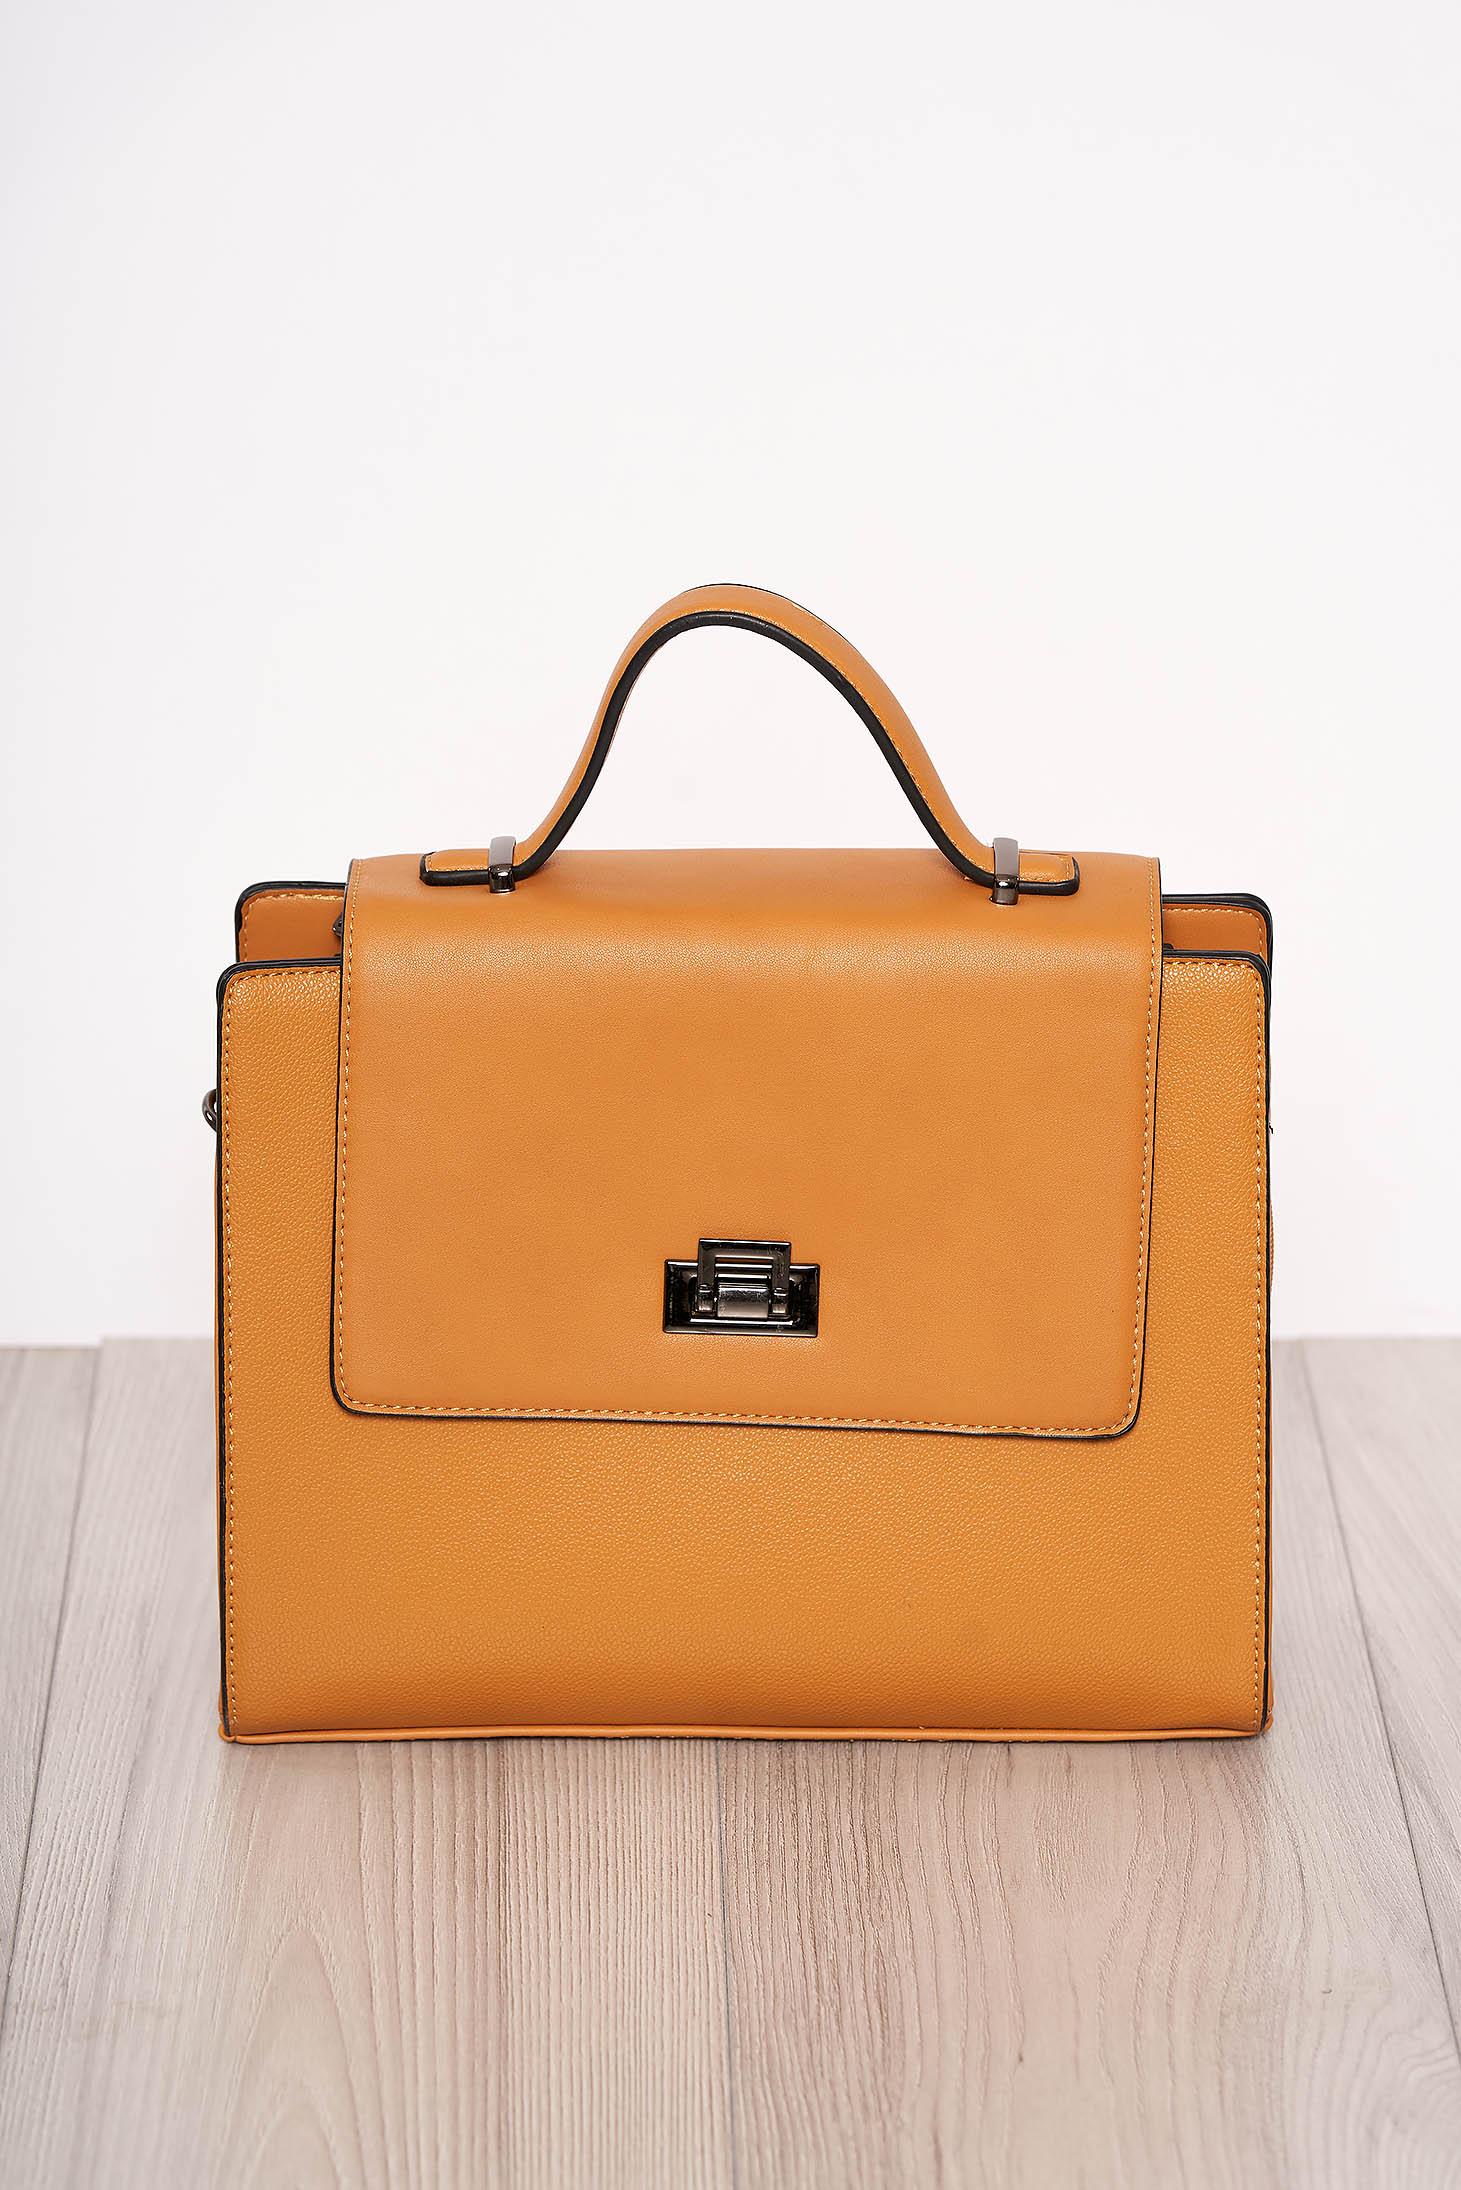 Bag yellow elegant faux leather short handles